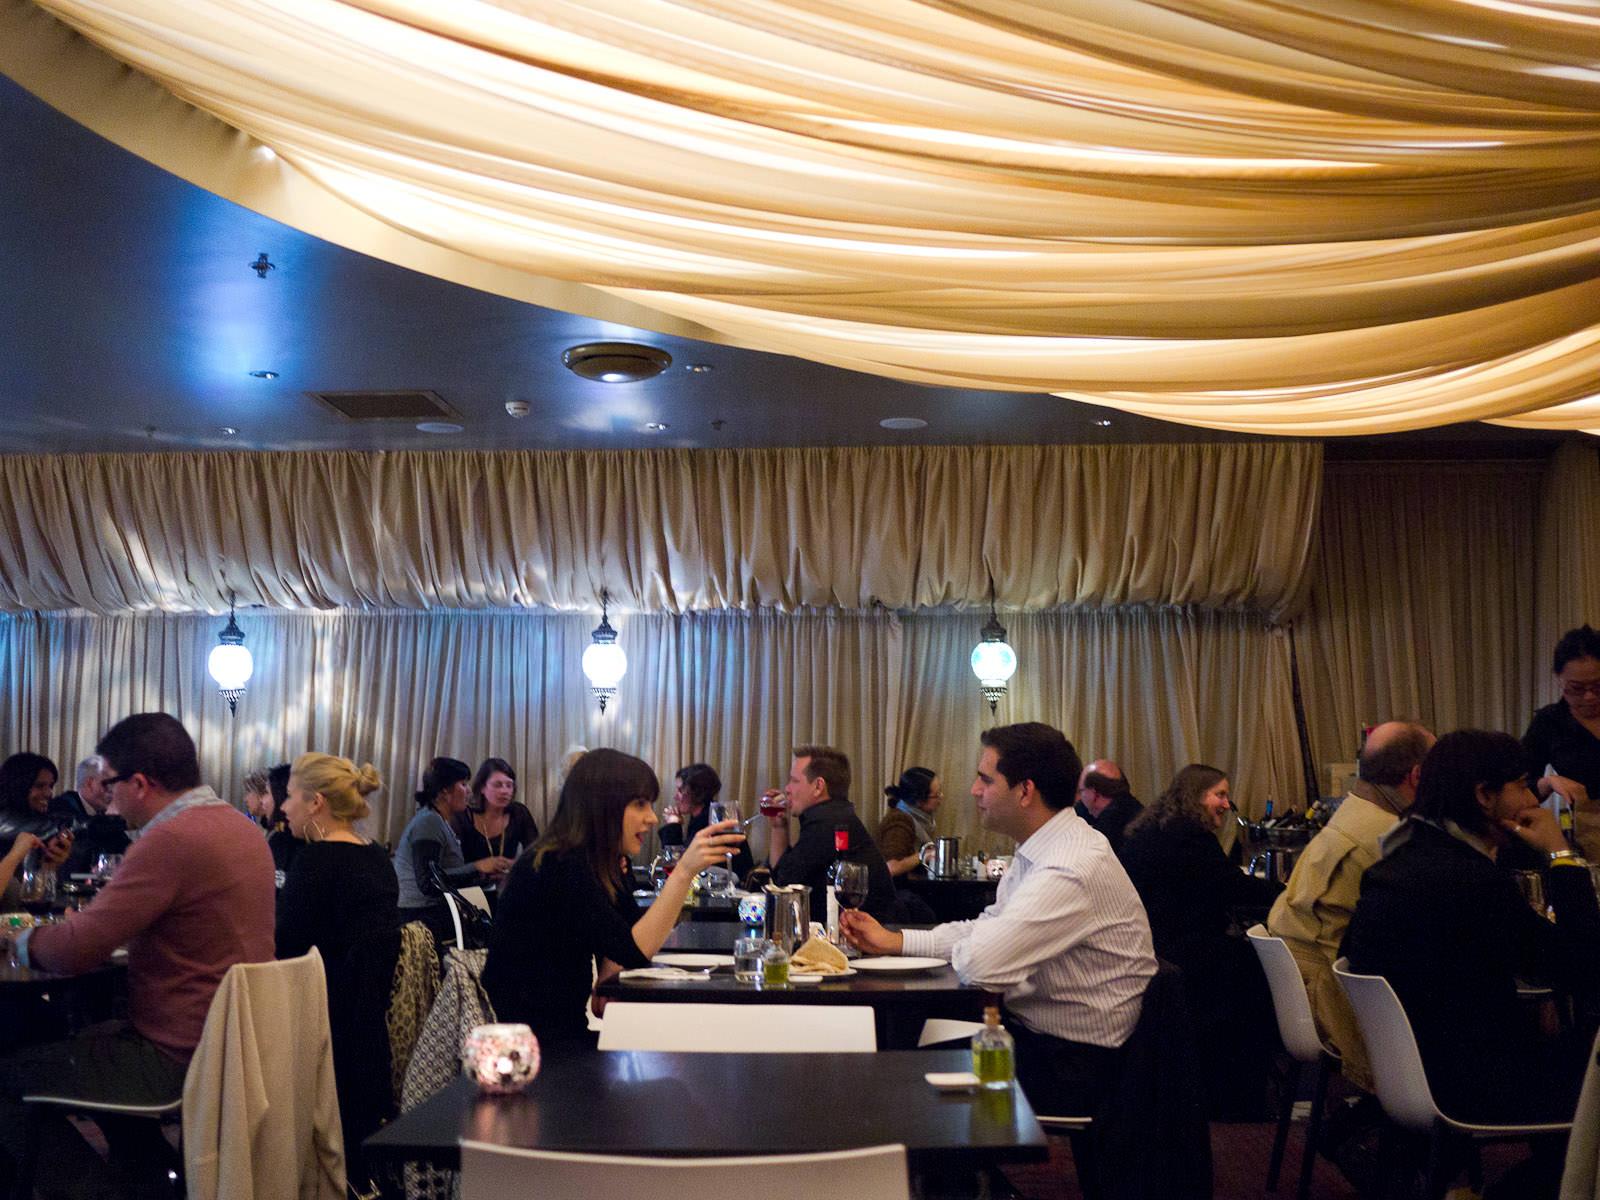 Xanthi Bar and Restaurant